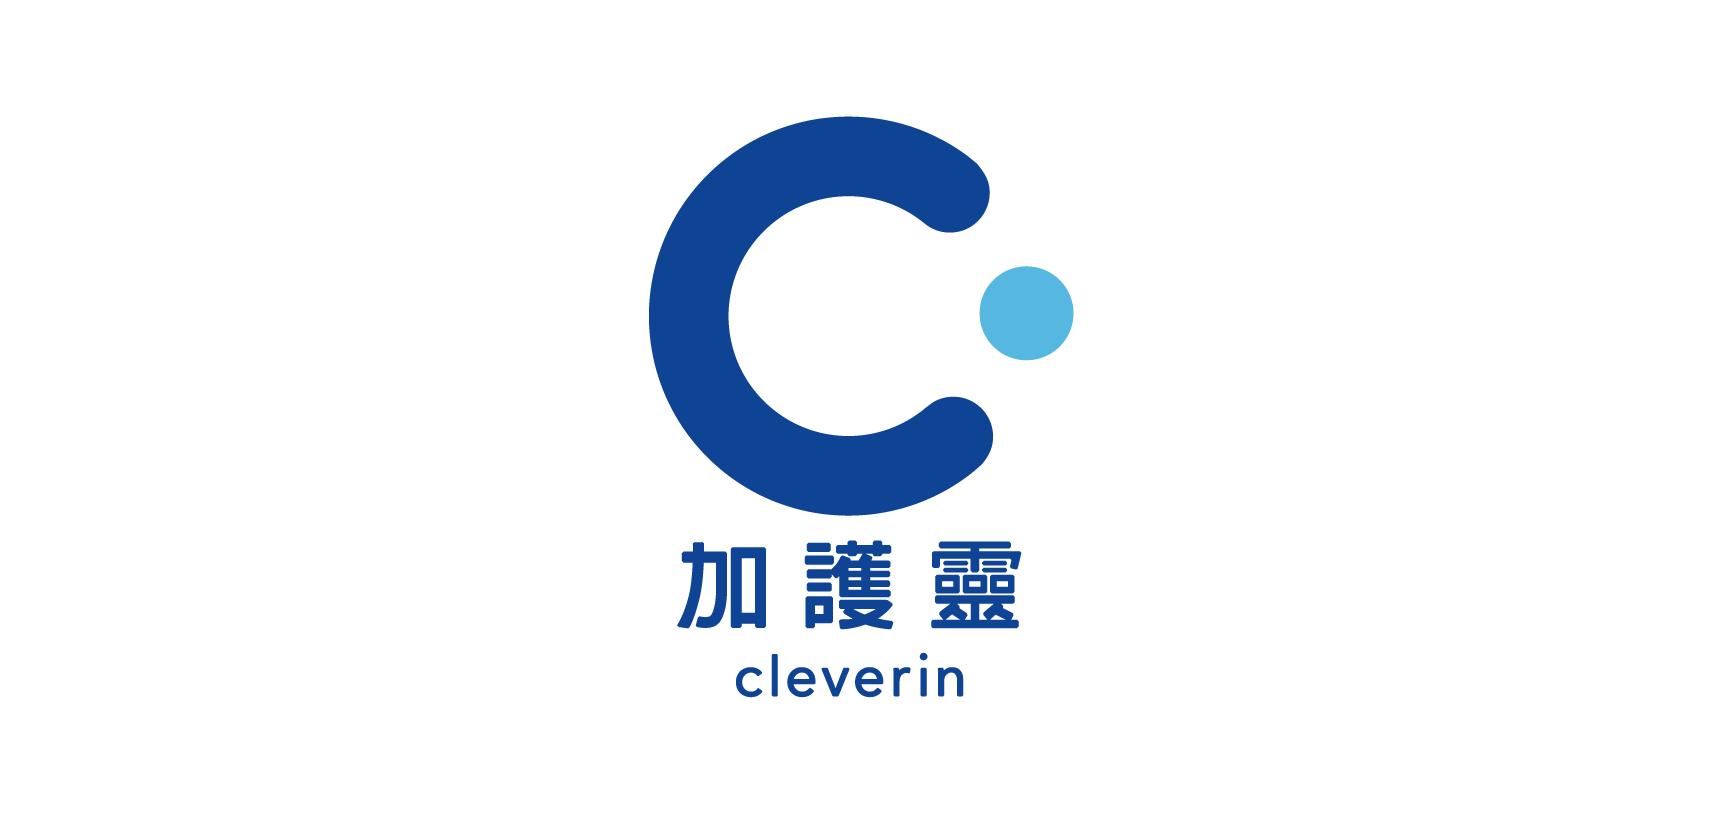 加護靈 cleverin logo